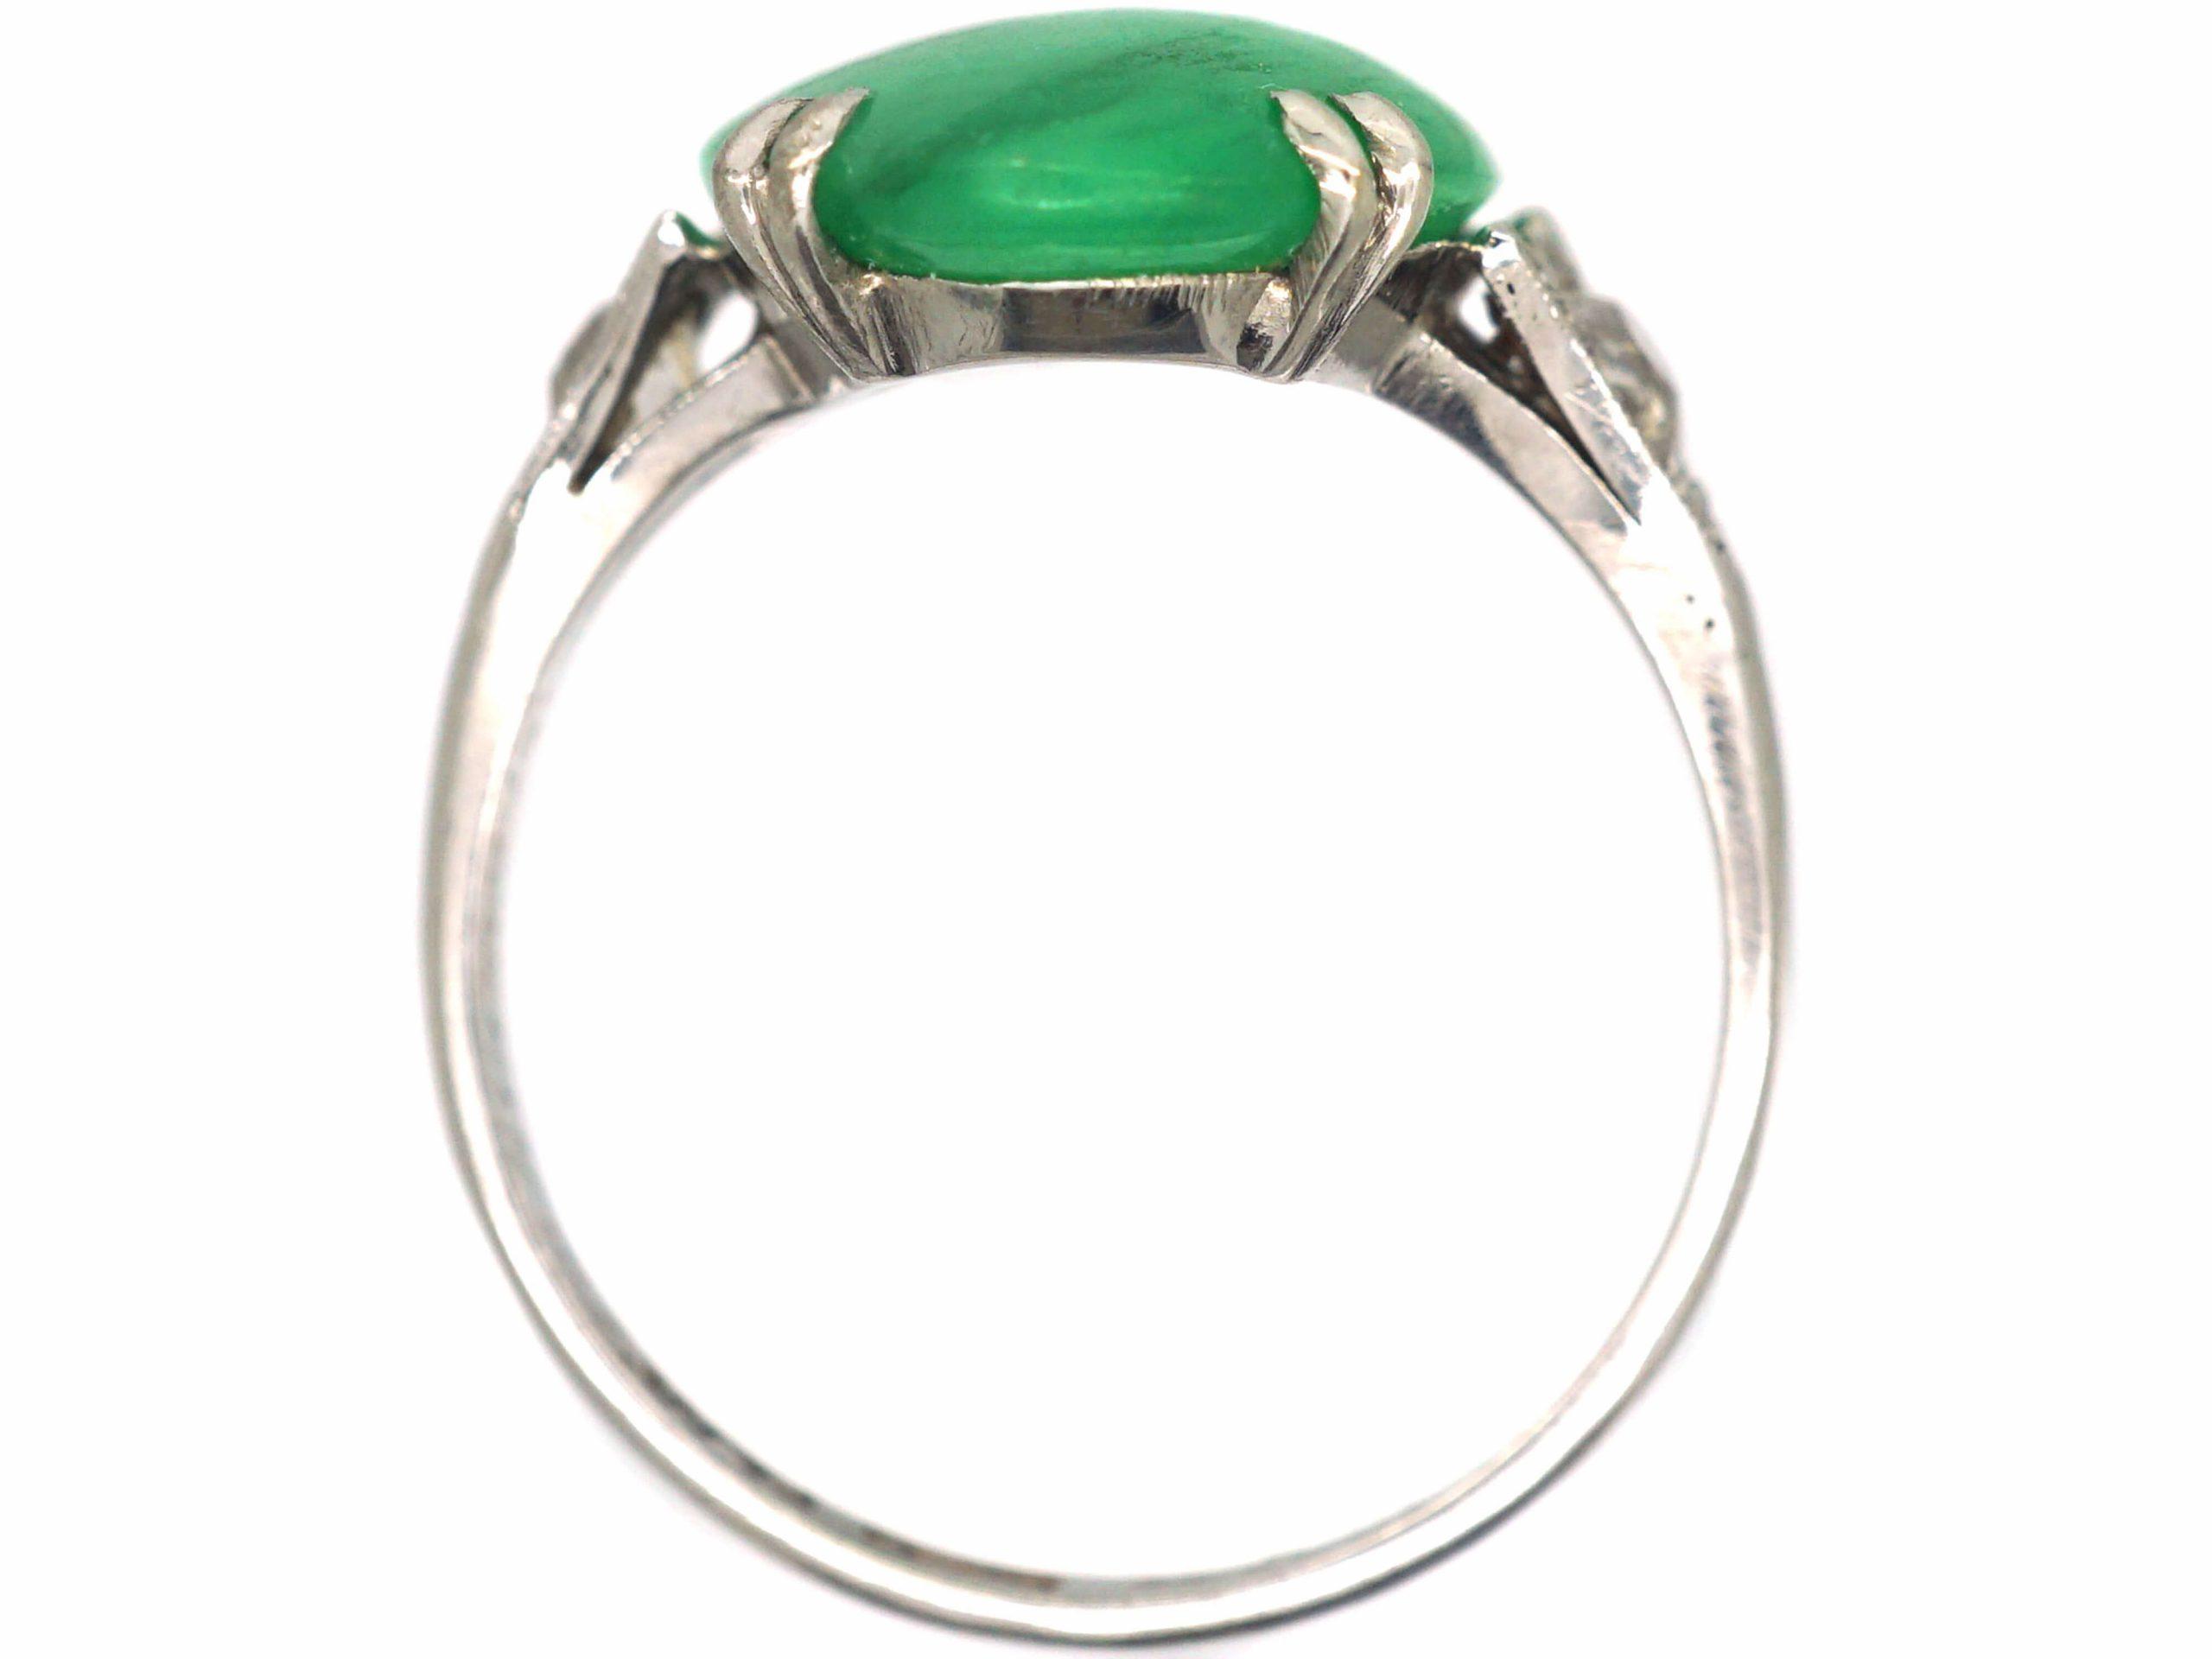 Art Deco 18ct White Gold & Platinum, Jade Ring with Diamond Set Shoulders